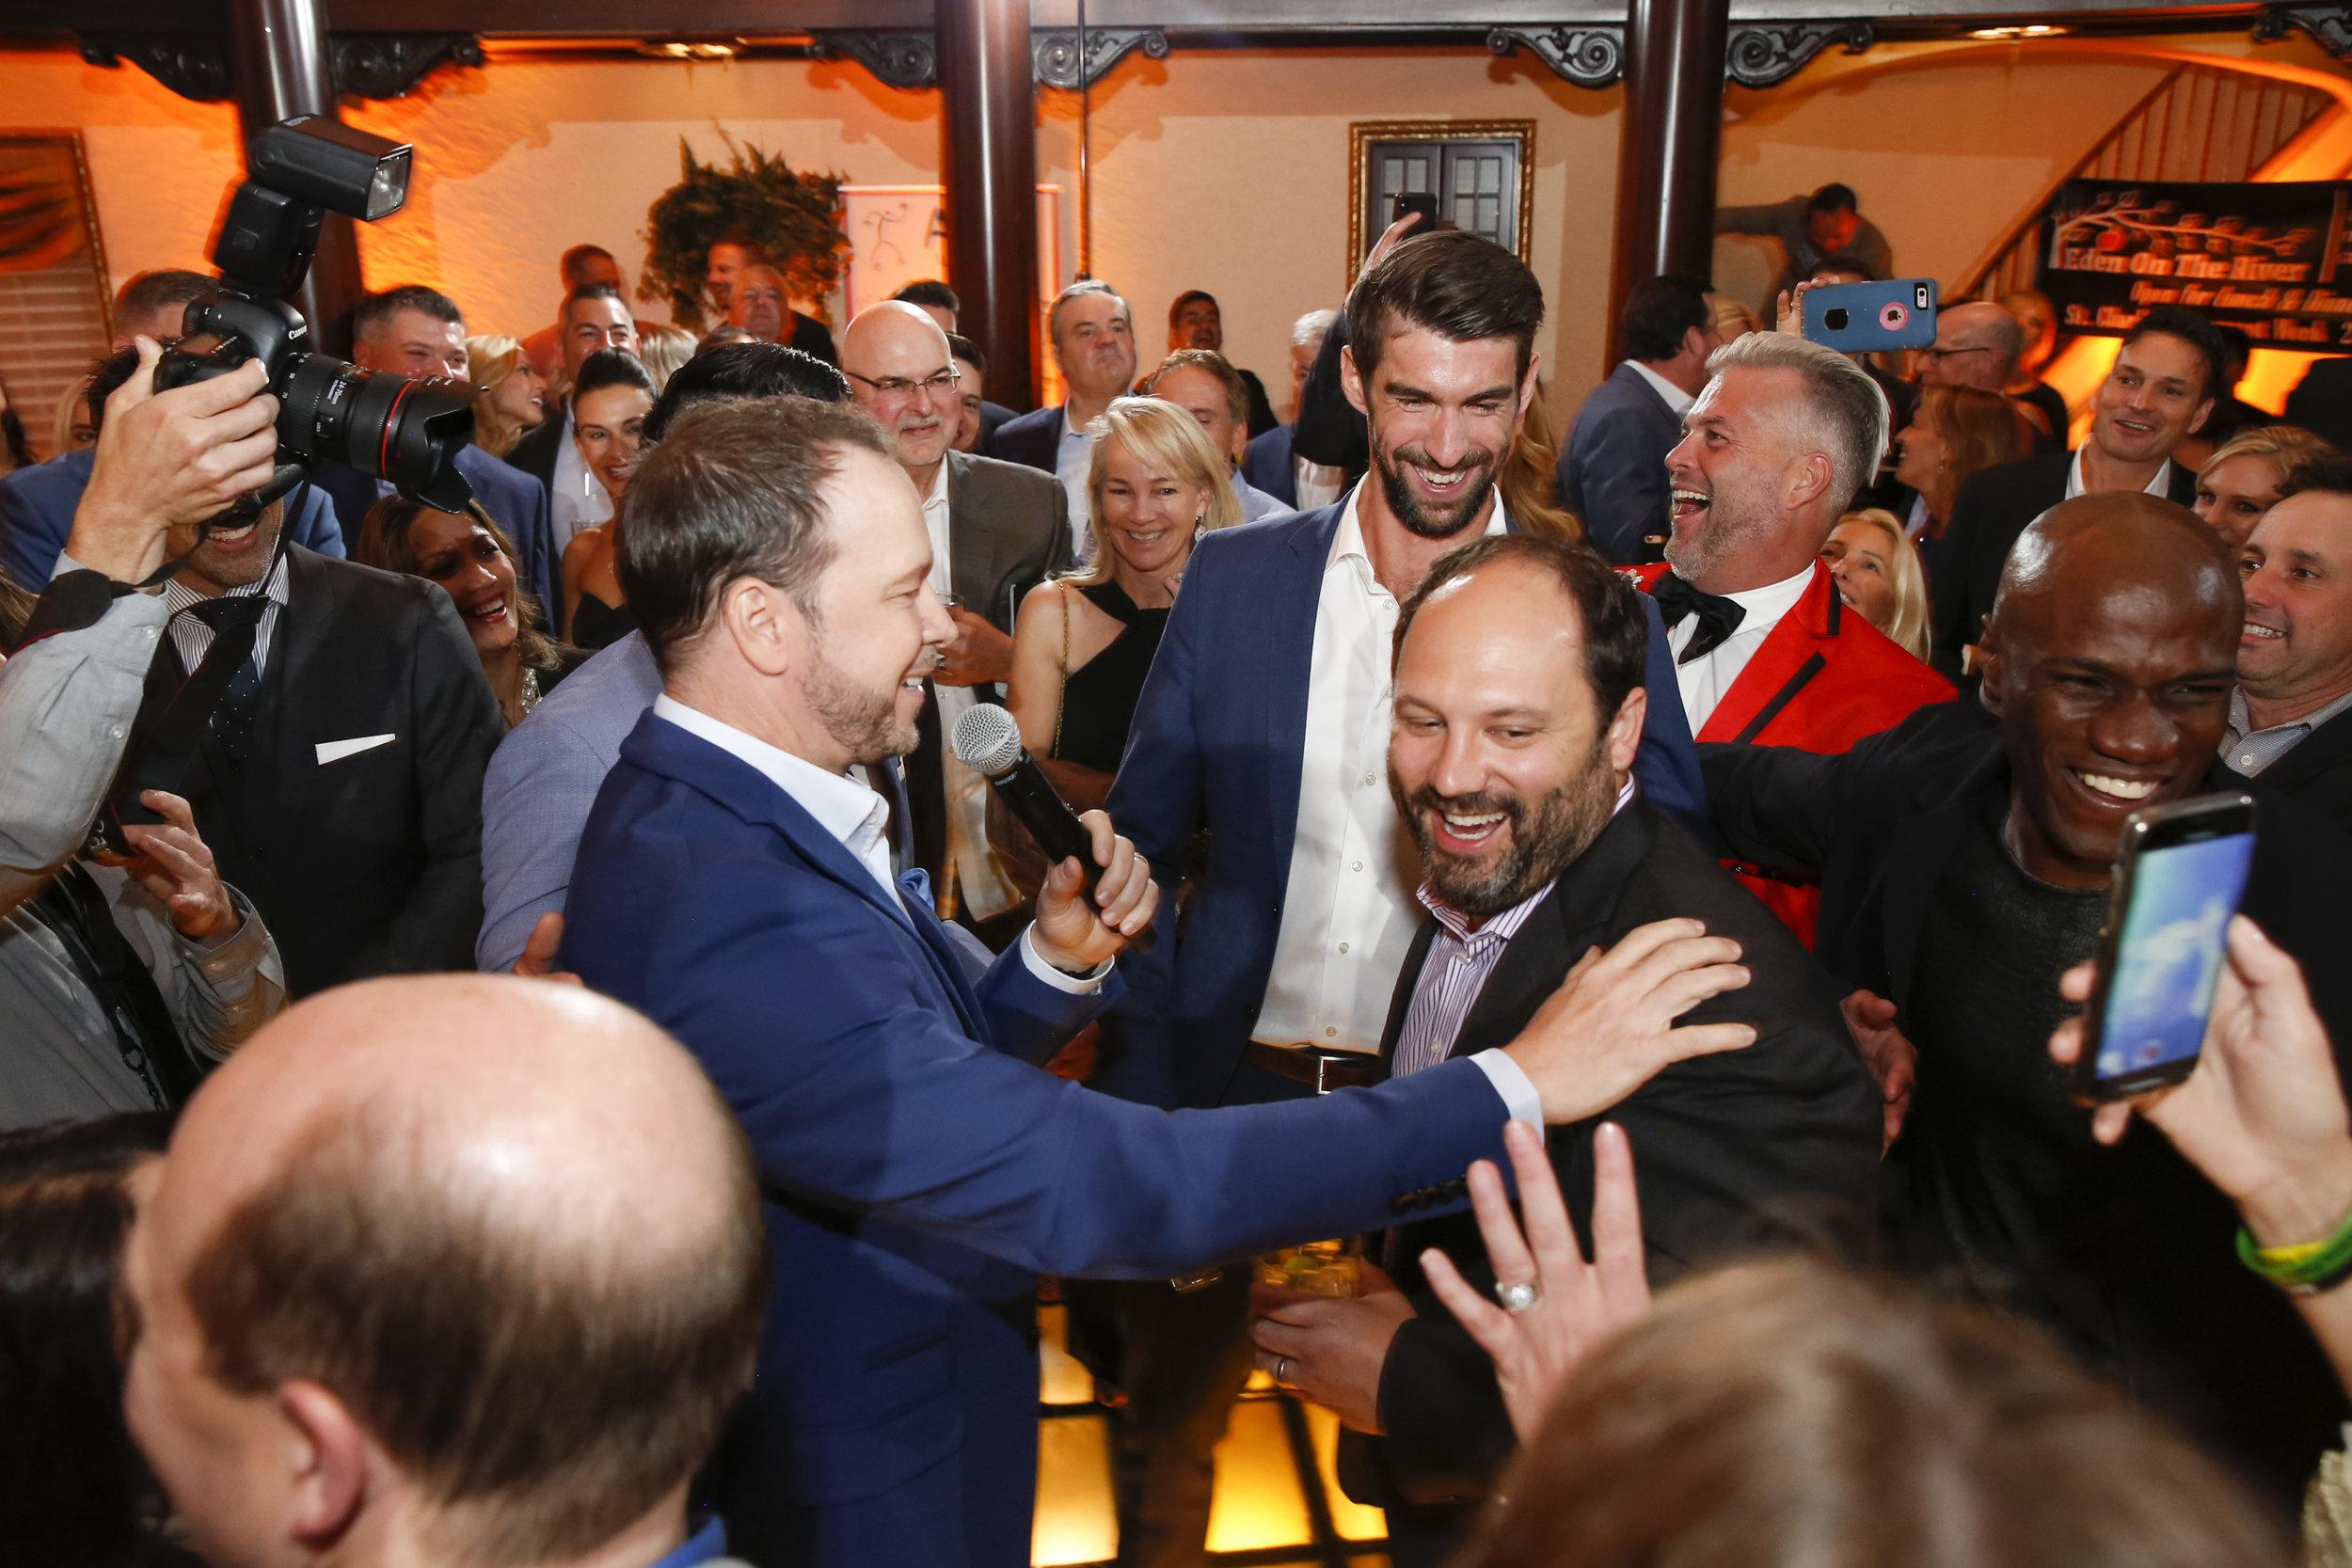 golf-give-gala-celebrity-michael-phelps-jason-day-event-photographer-madison-wi-45.jpg